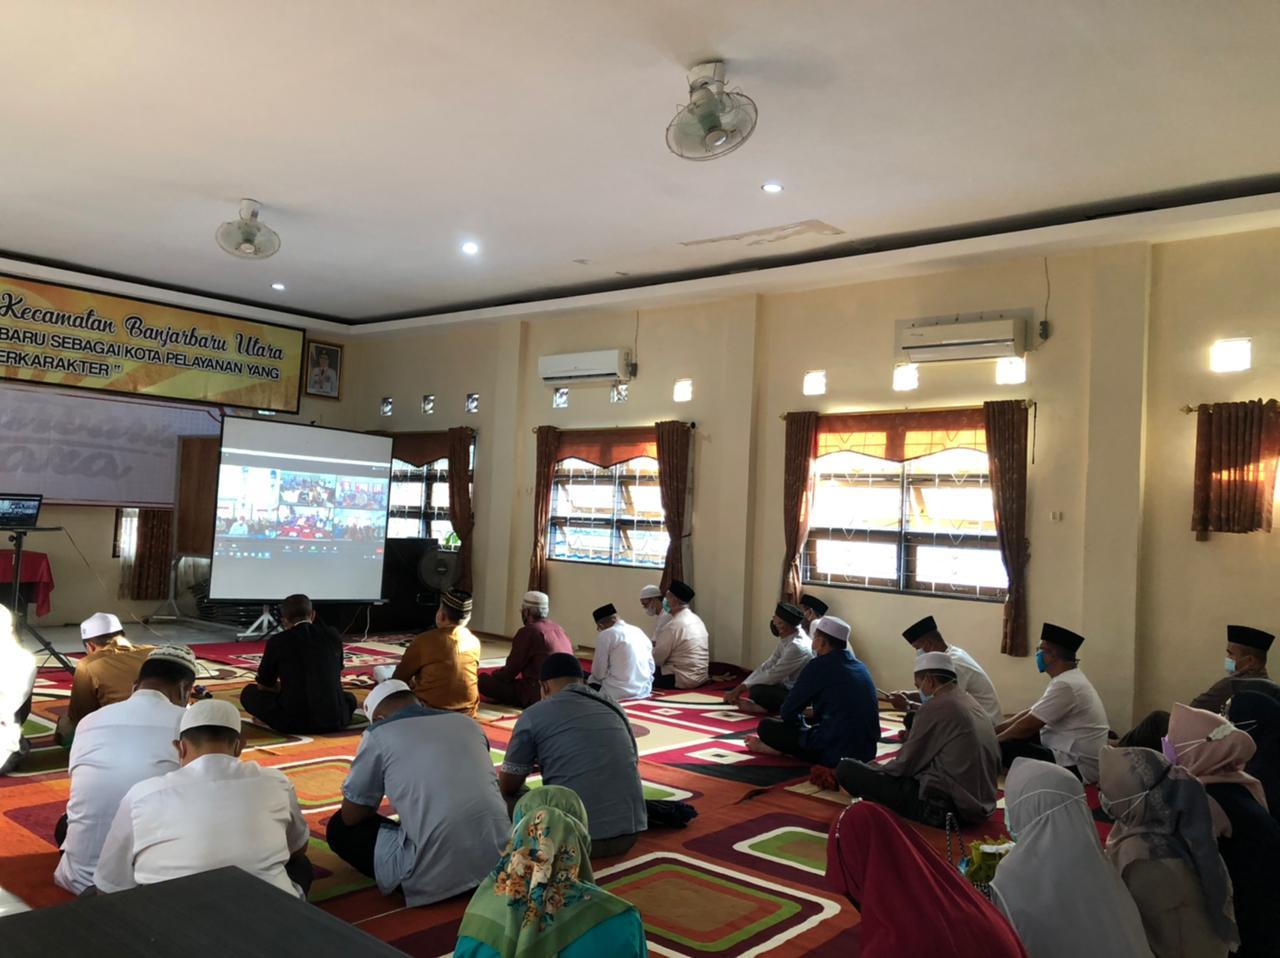 Kecamatan Banjarbaru Utara Melaksanakan Kegiatan Puncak Hari Jadi Banjarbaru ke 22